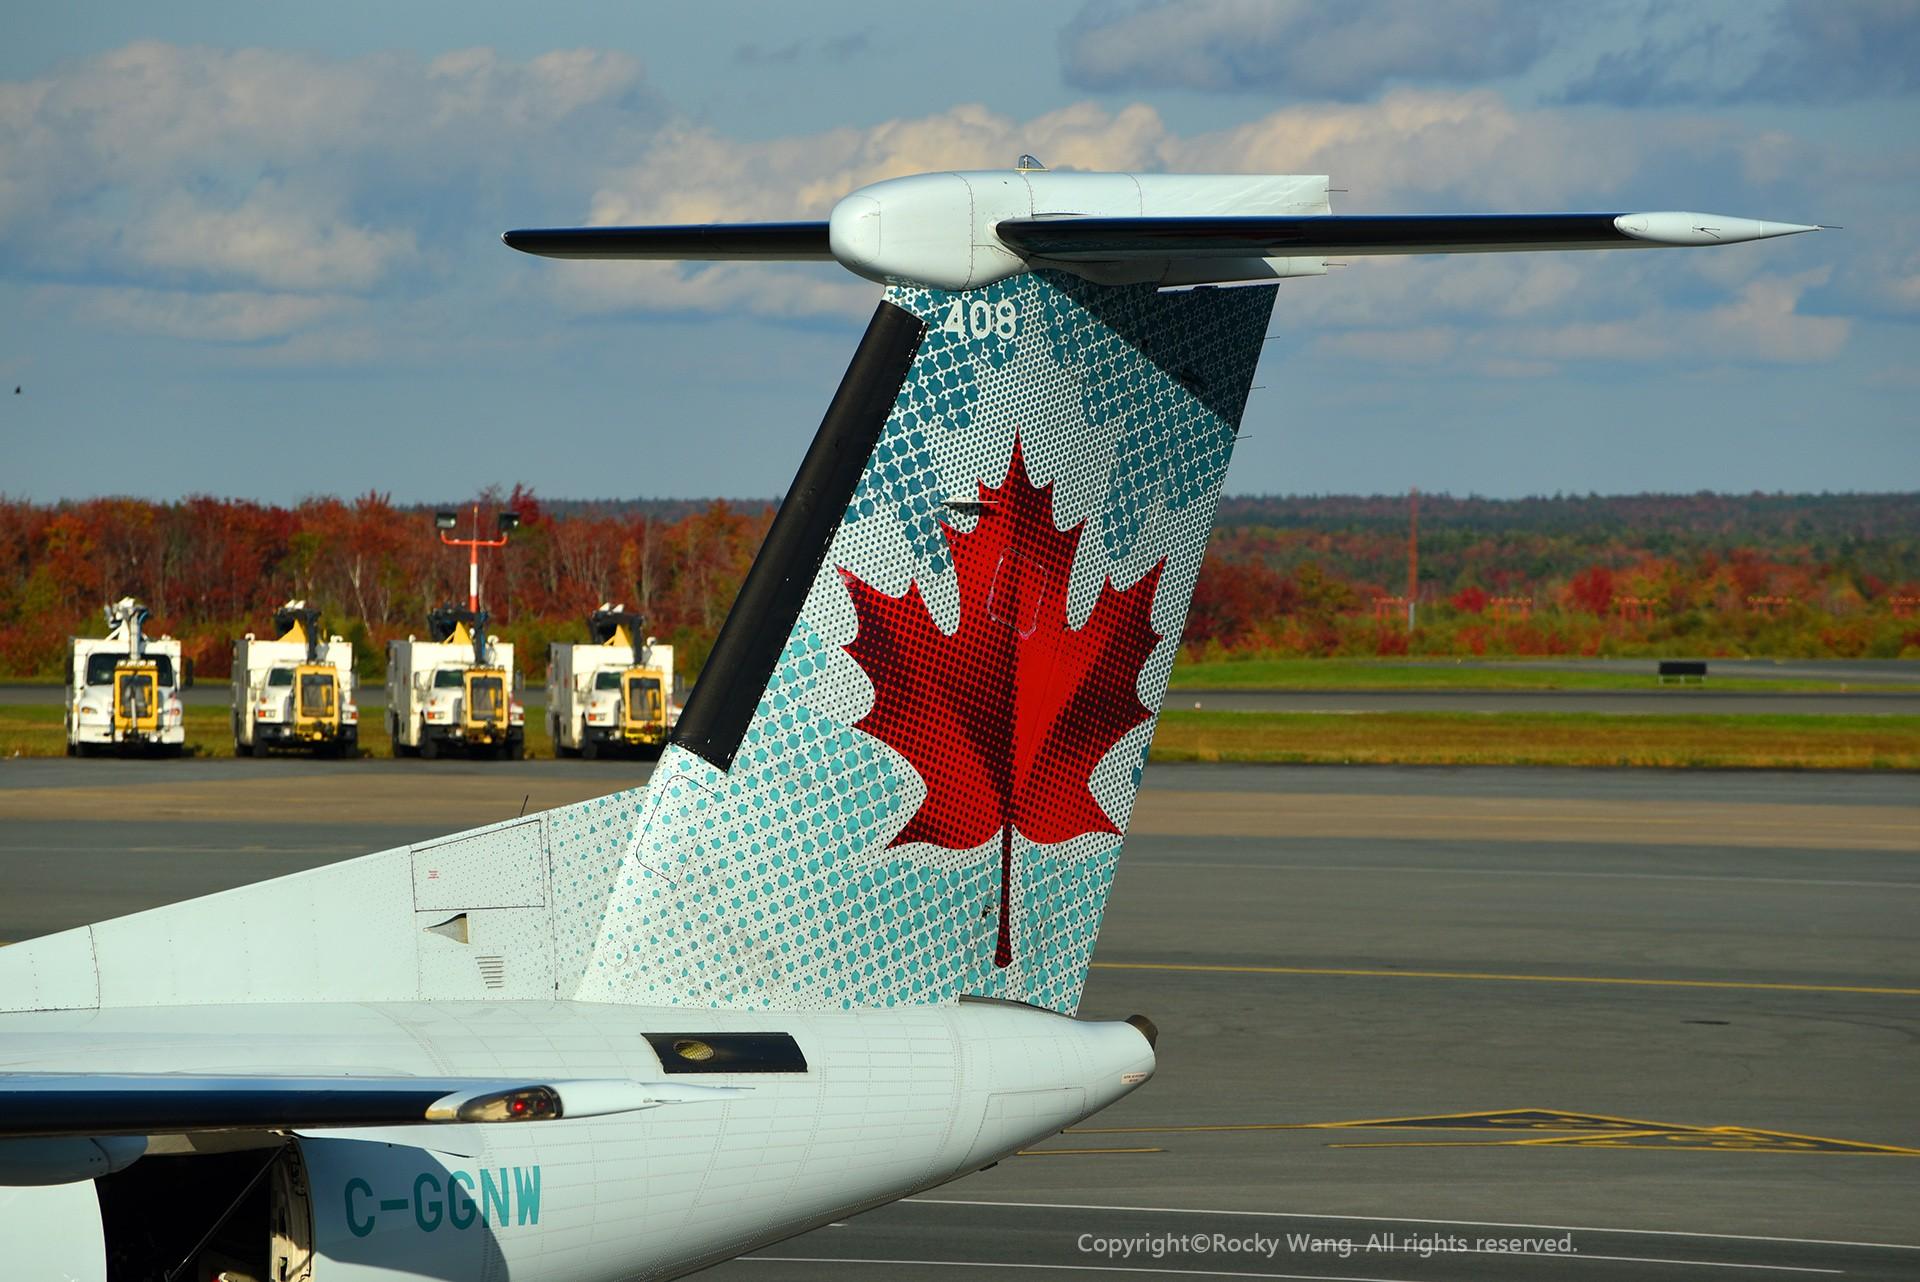 Re:[原创]简易版游记,纪念一次30段的环球飞行和一些碎碎念 BOMBARDIER DASH 8-Q402 C-GGNW Halifax Int'l Airport